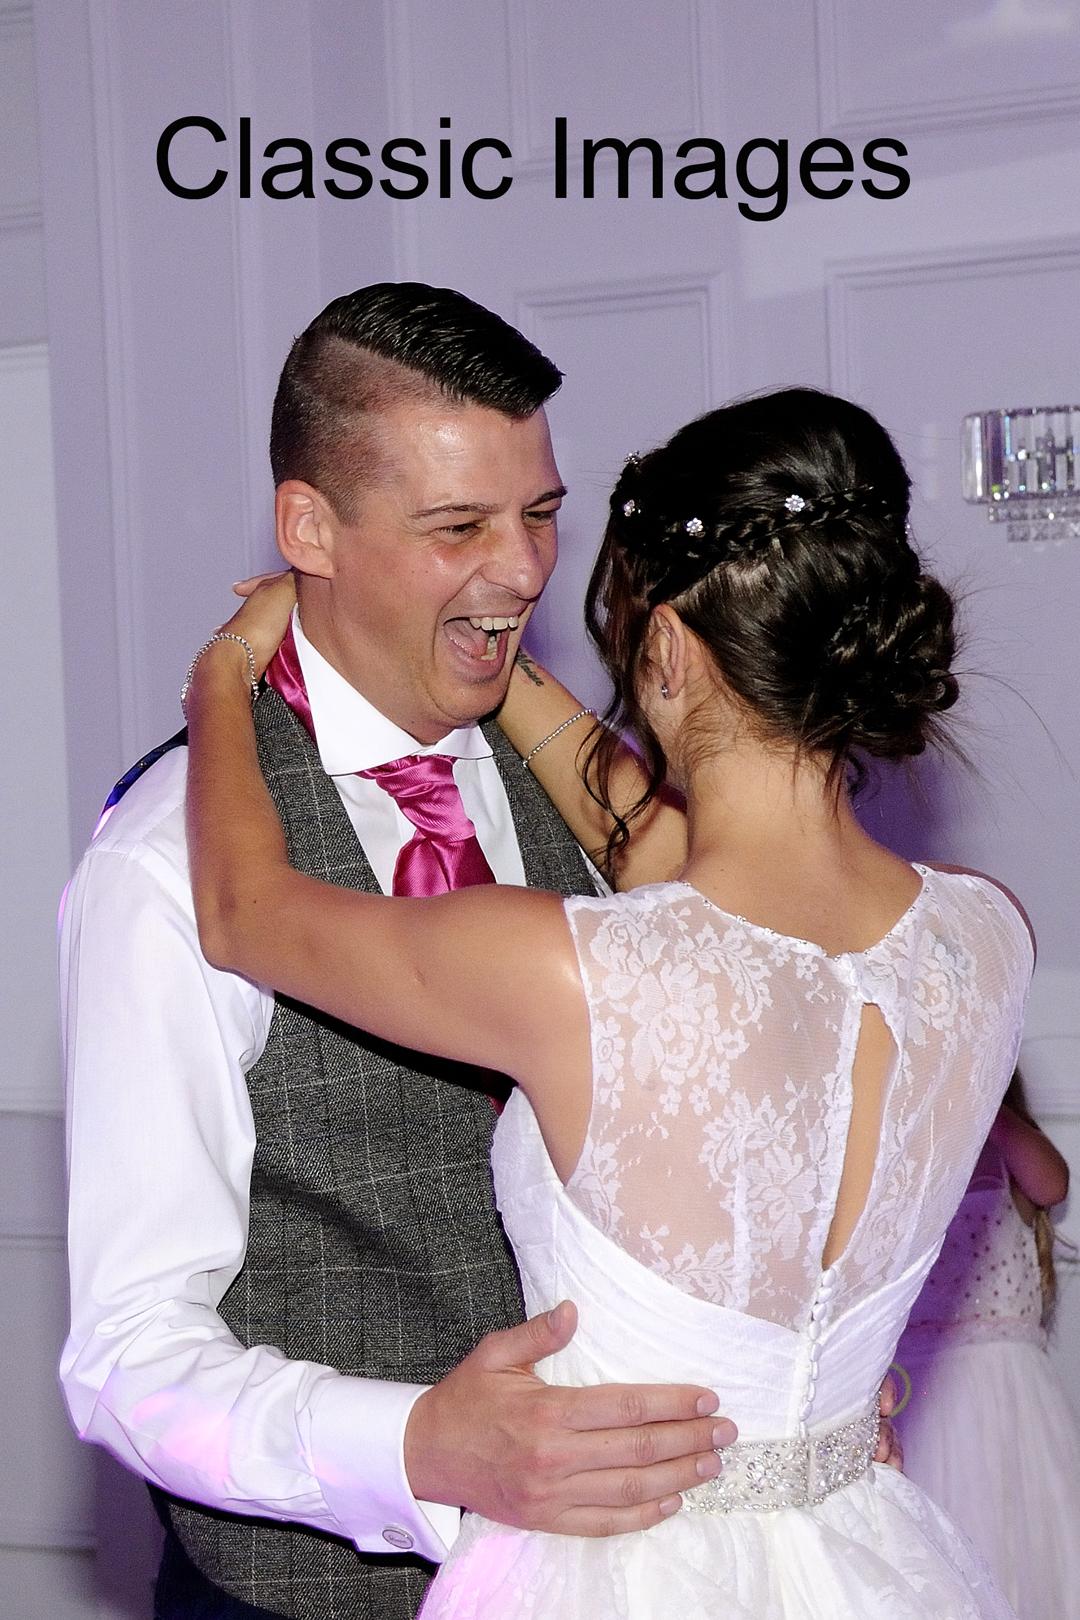 first-dance-wedding-photo-classic-images-sunbury-surrey